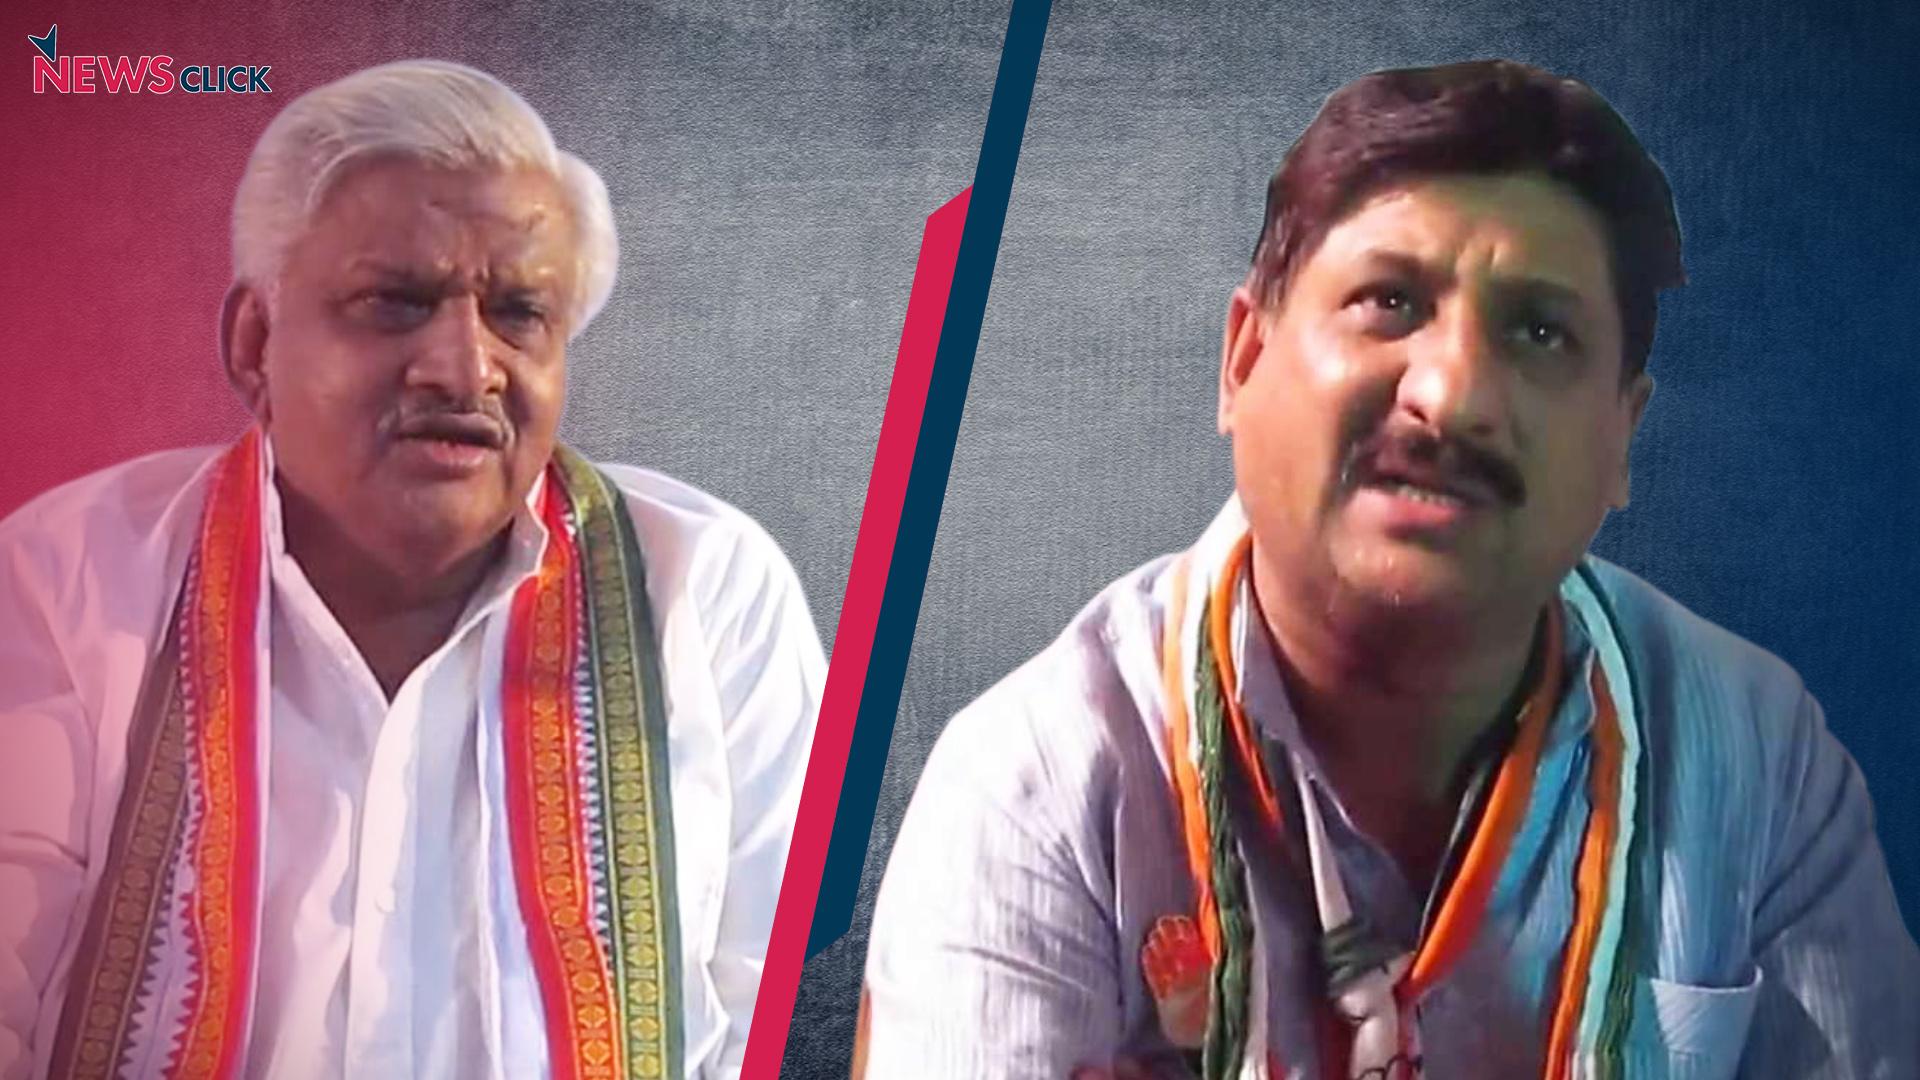 Arif Aqueel and Arif Masood